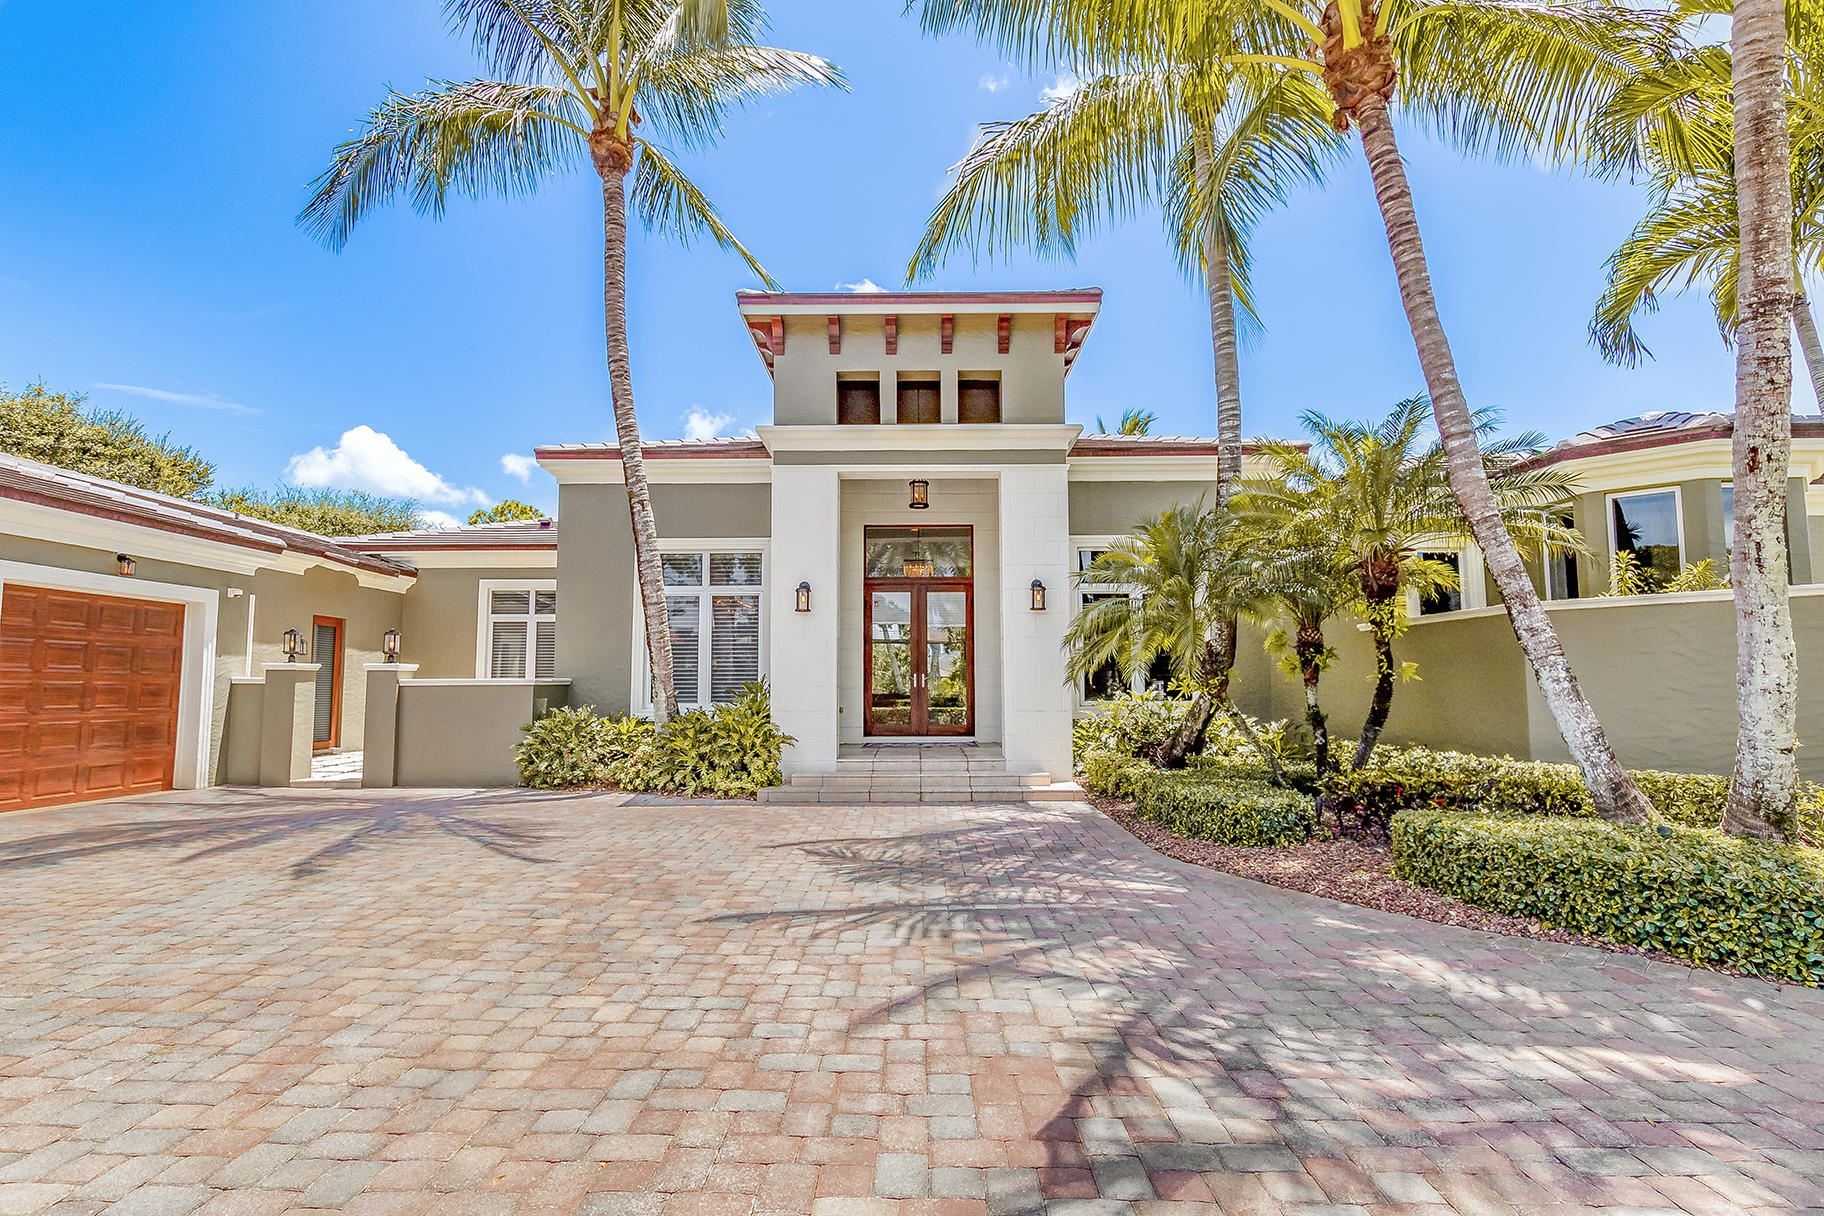 1082 Breakers West, West Palm Beach, 33411 Photo 1